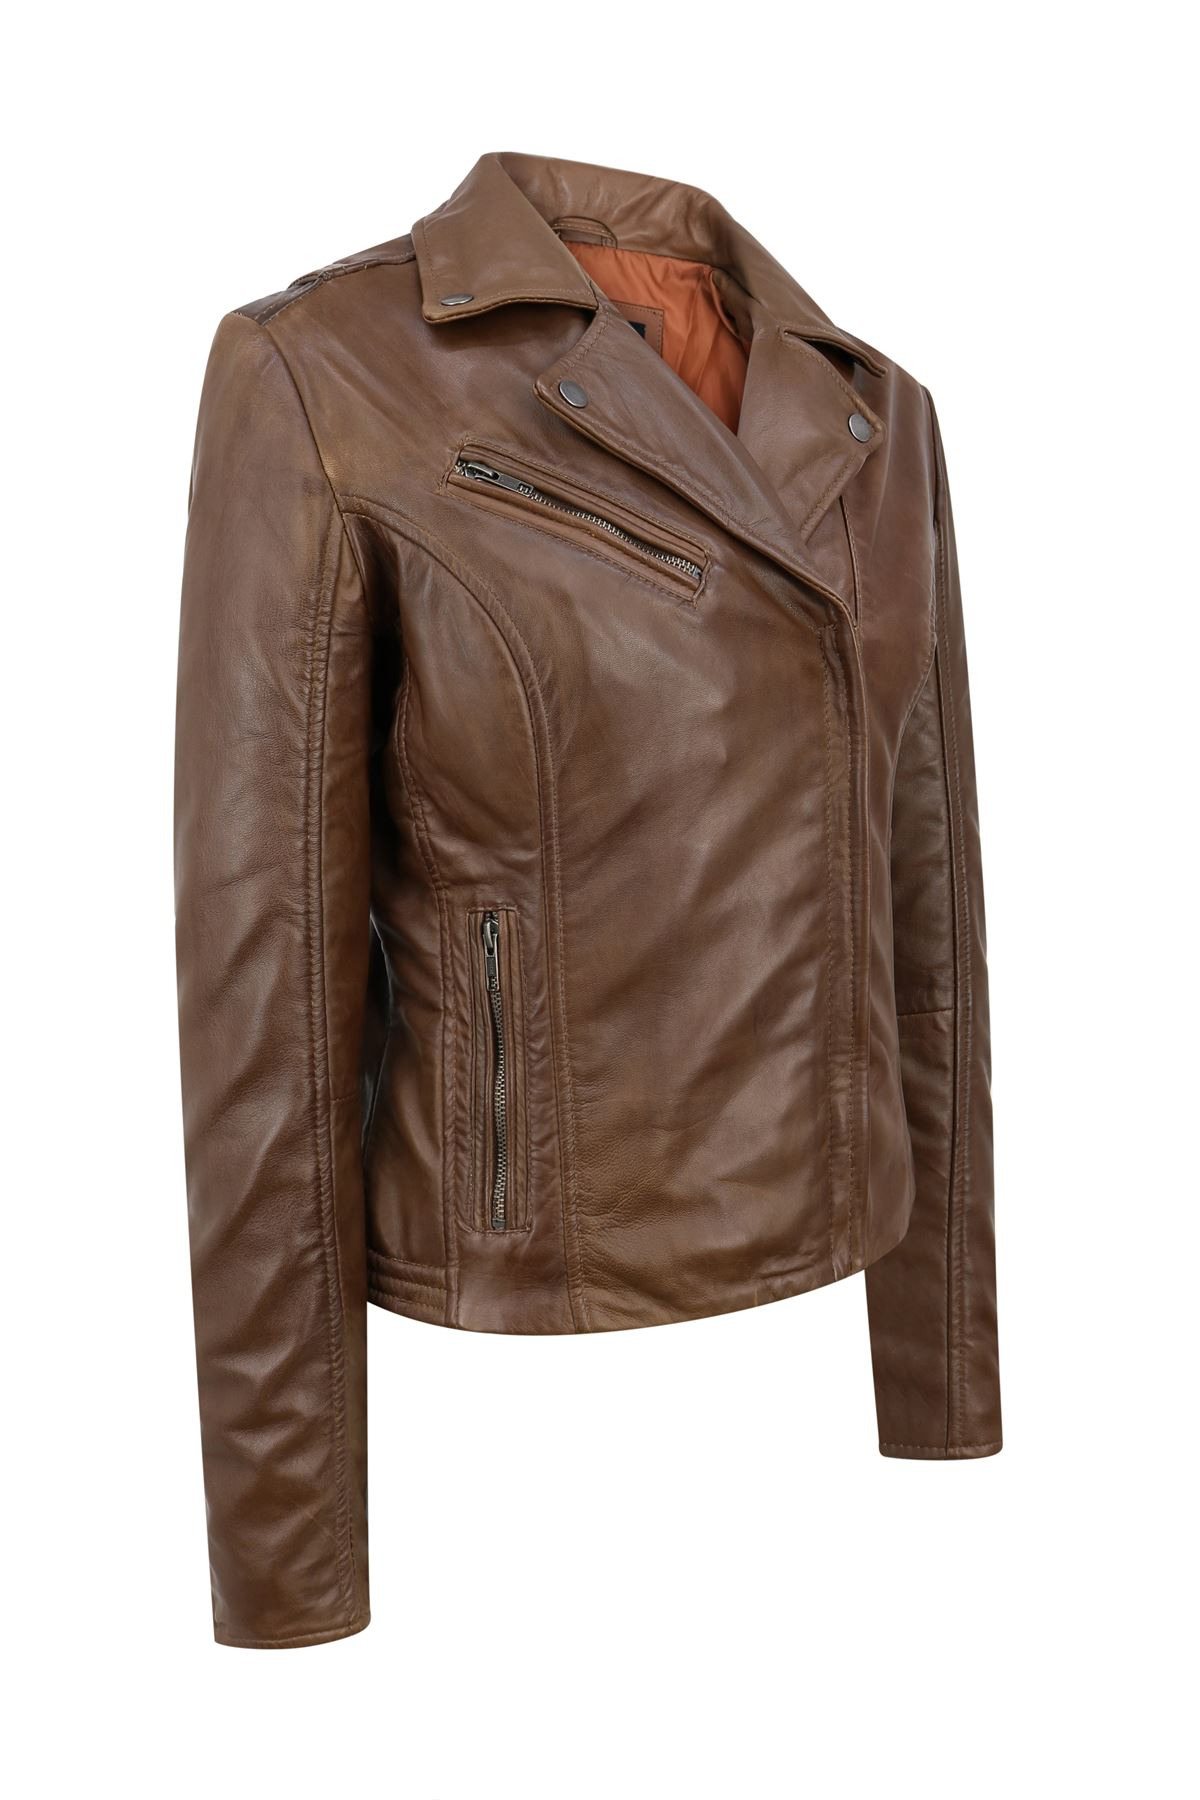 Blouson-femme-cuir-Napa-veritable-fermeture-zip-diagonale-ajuste miniature 3